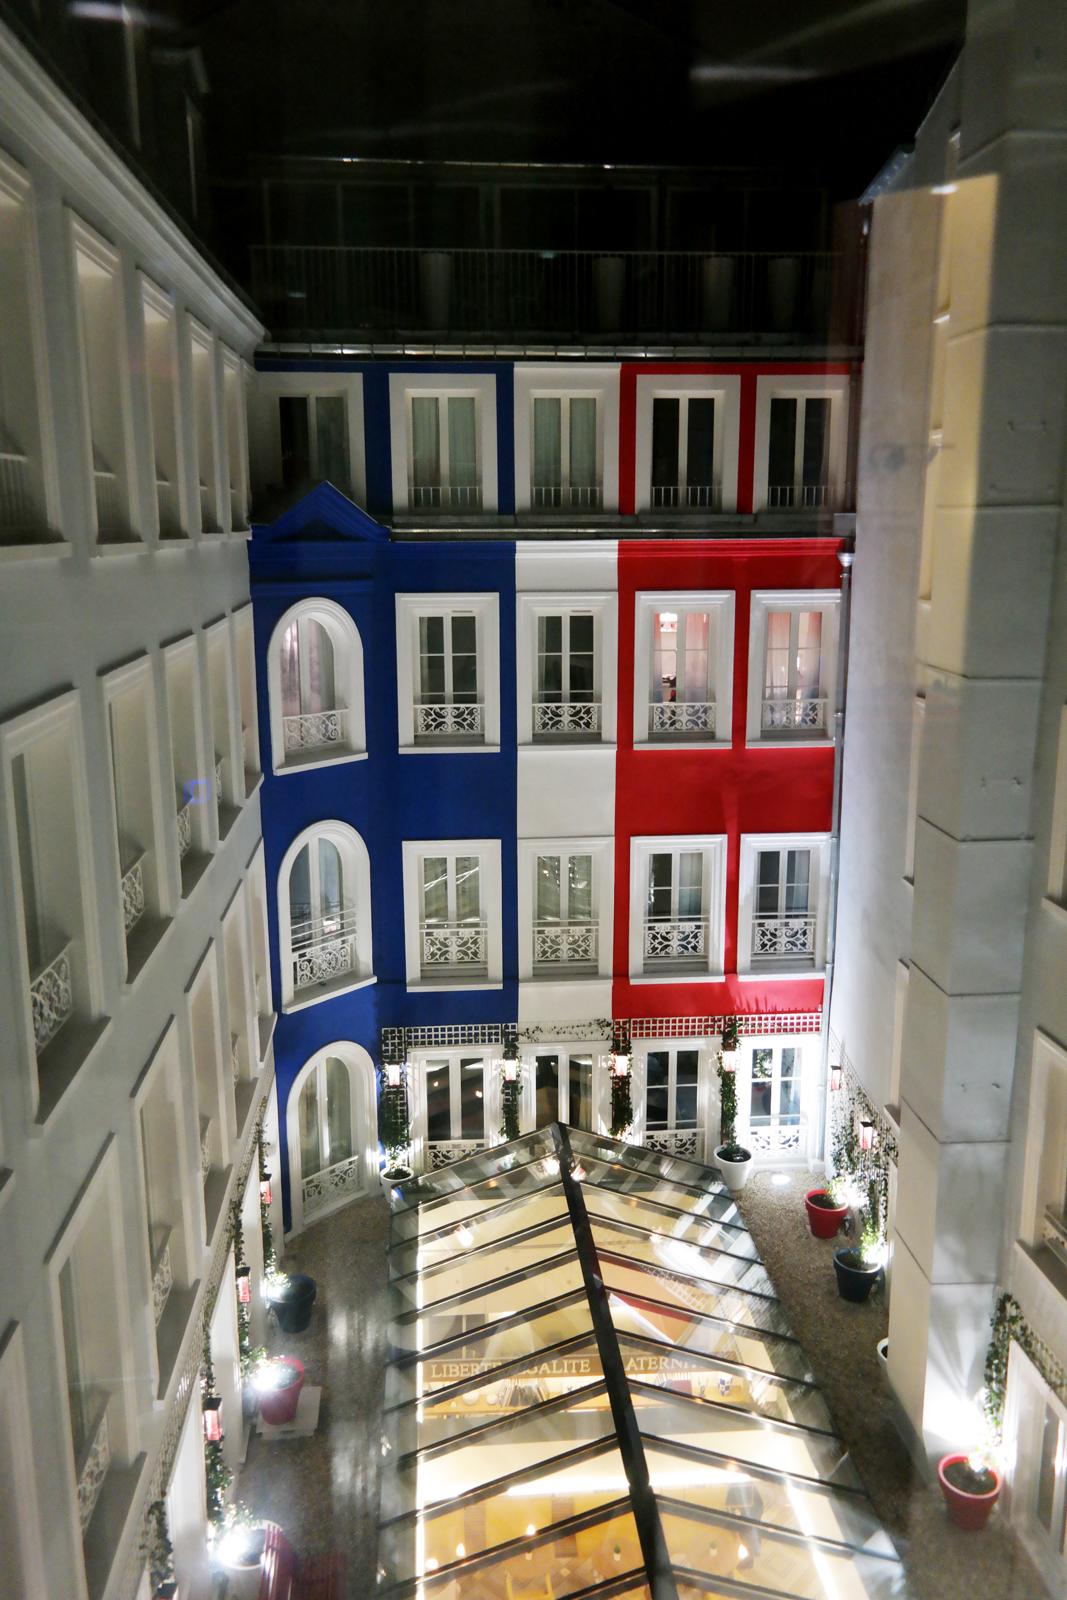 astotel 34b hotel paris a unique concept for france lovers. Black Bedroom Furniture Sets. Home Design Ideas